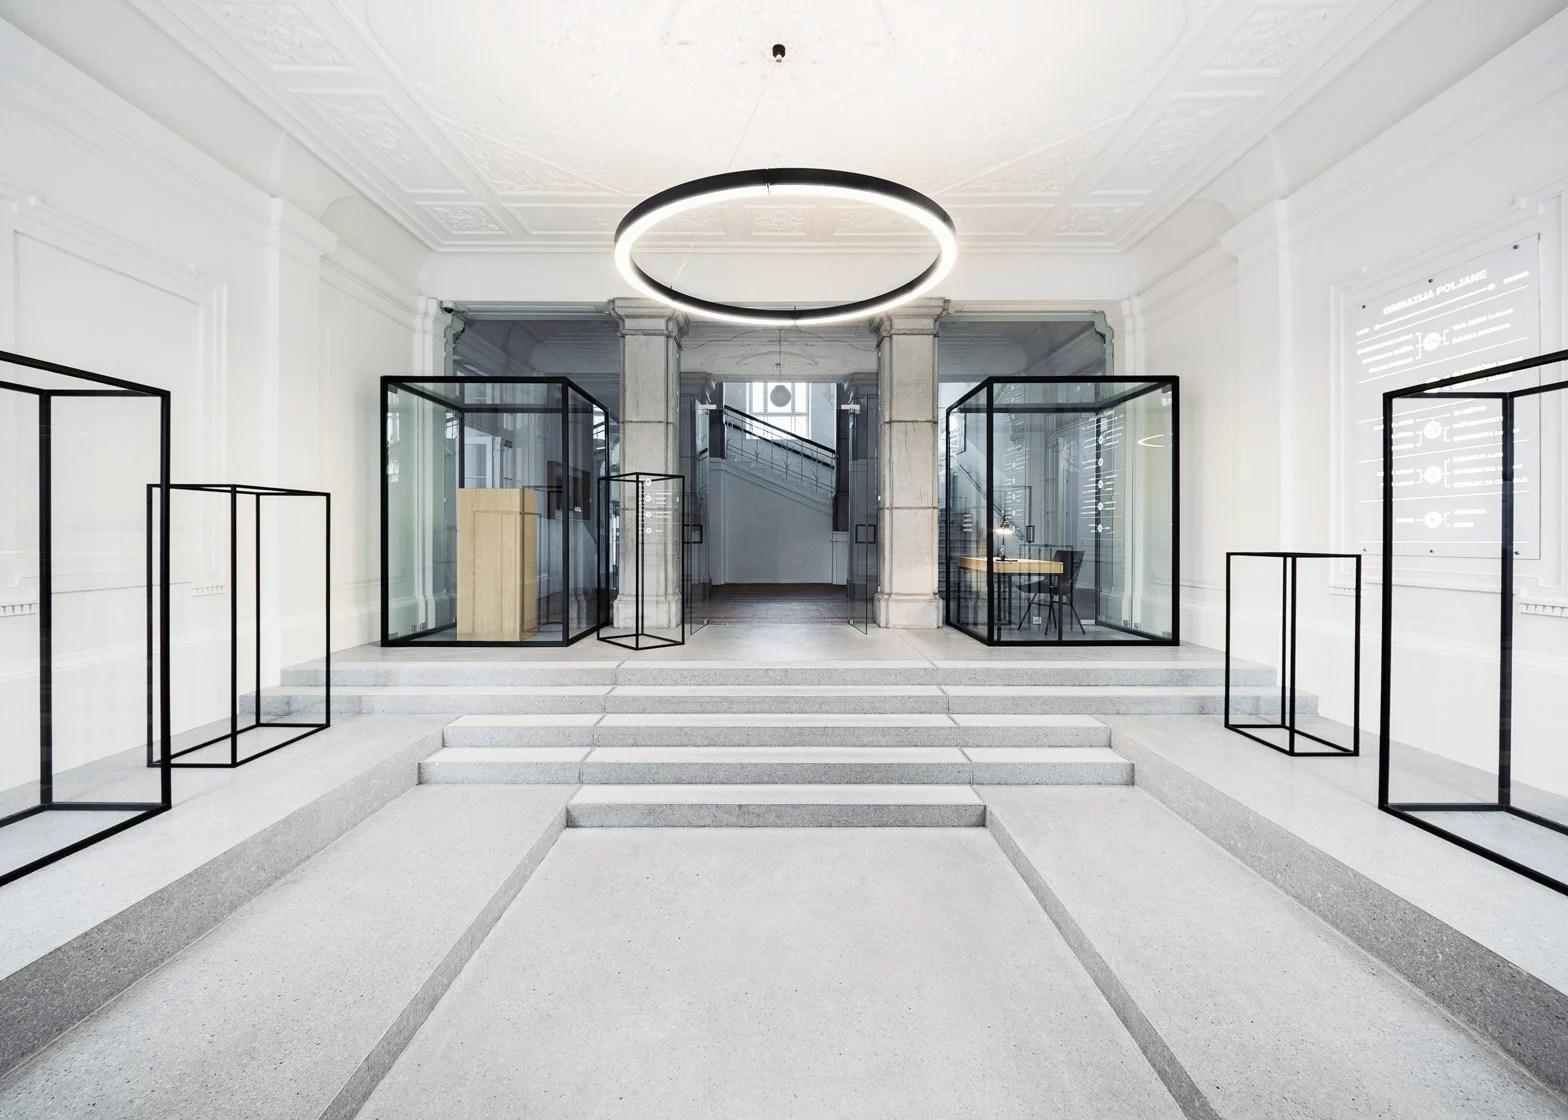 Svet Vmes adds blackframed glass cabinets to school entrance